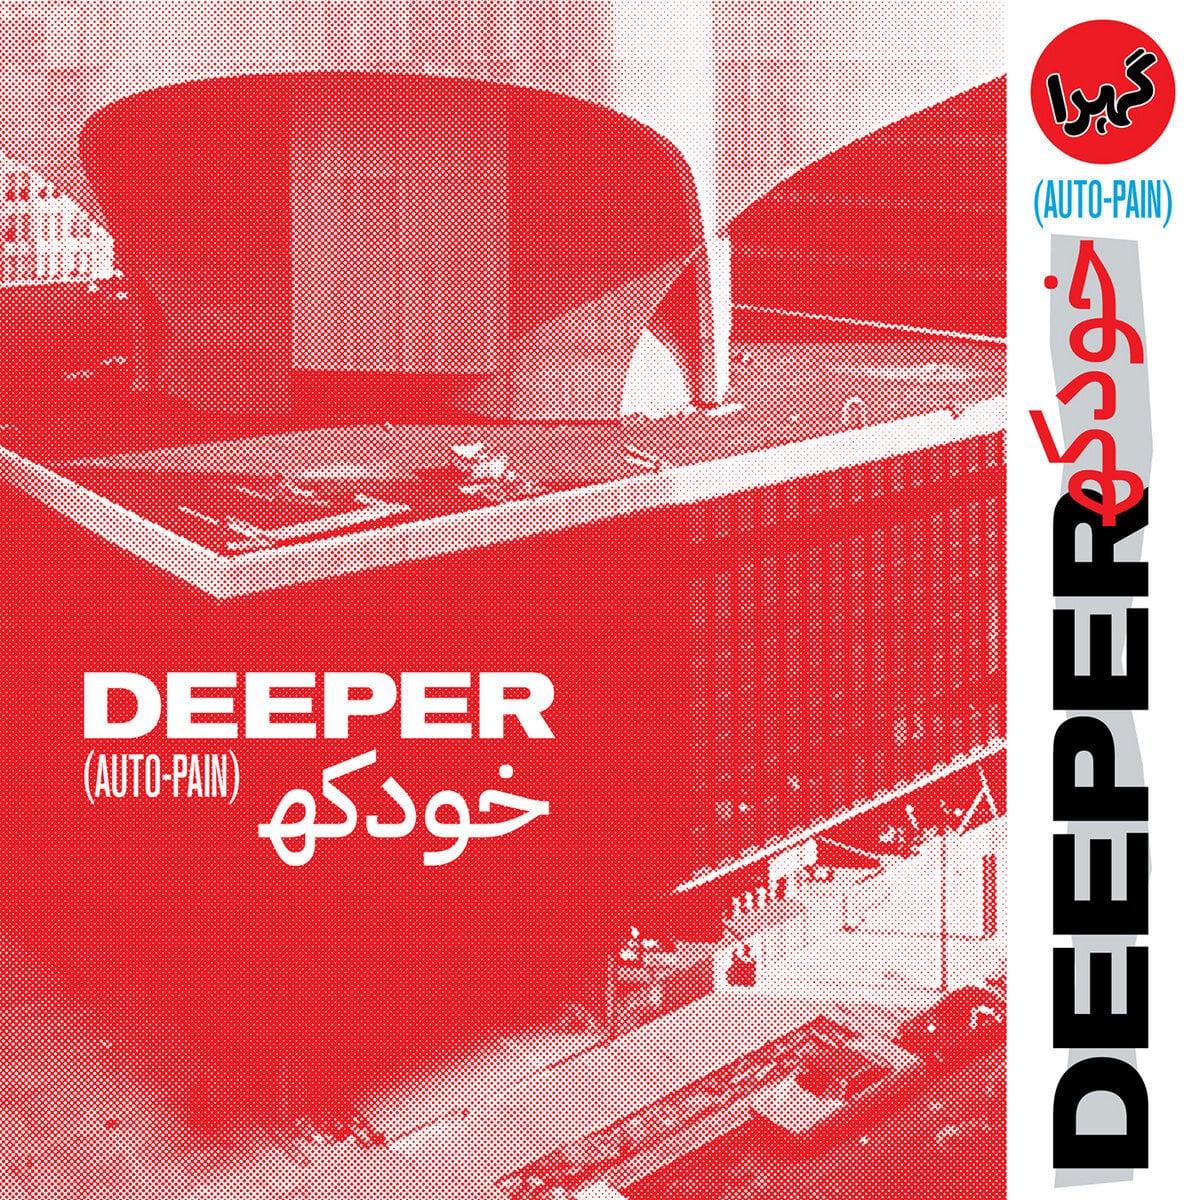 Deeper / Auto-Pain(LP)